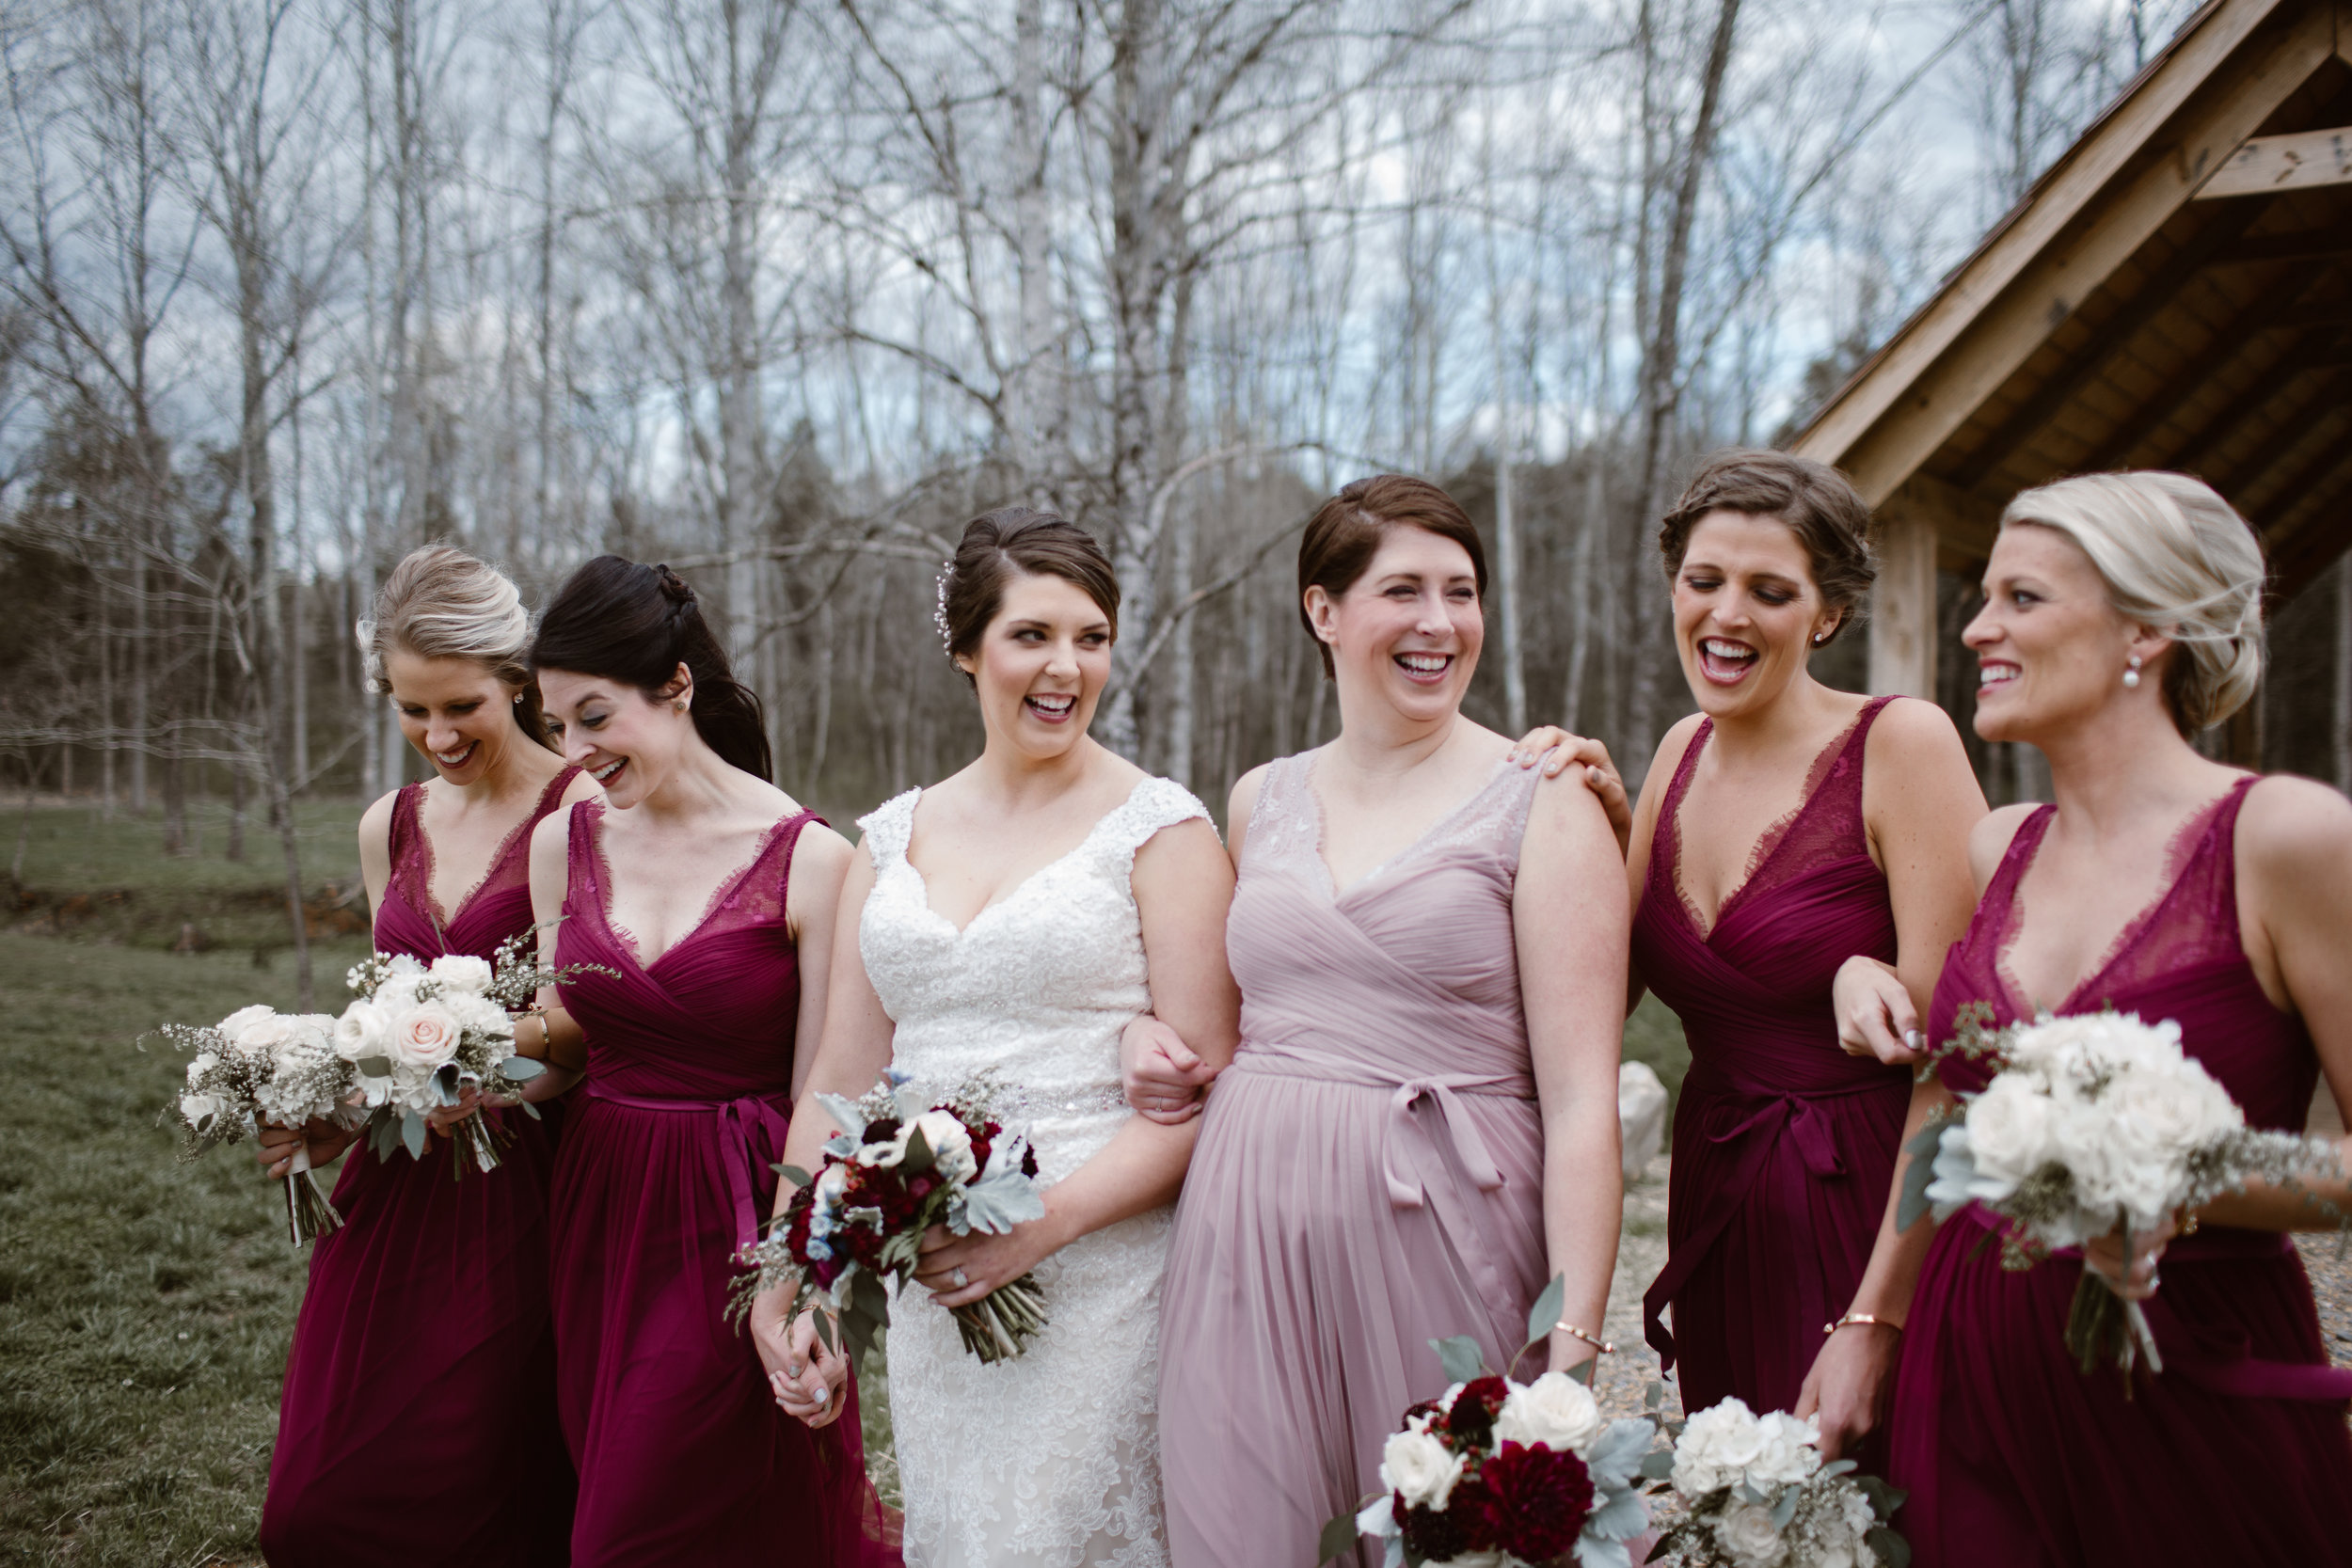 Maroon bridesmaid Dresses - A Burgundy + Bronze Ramble Creek Fall Wedding - Erin Morrison Photography